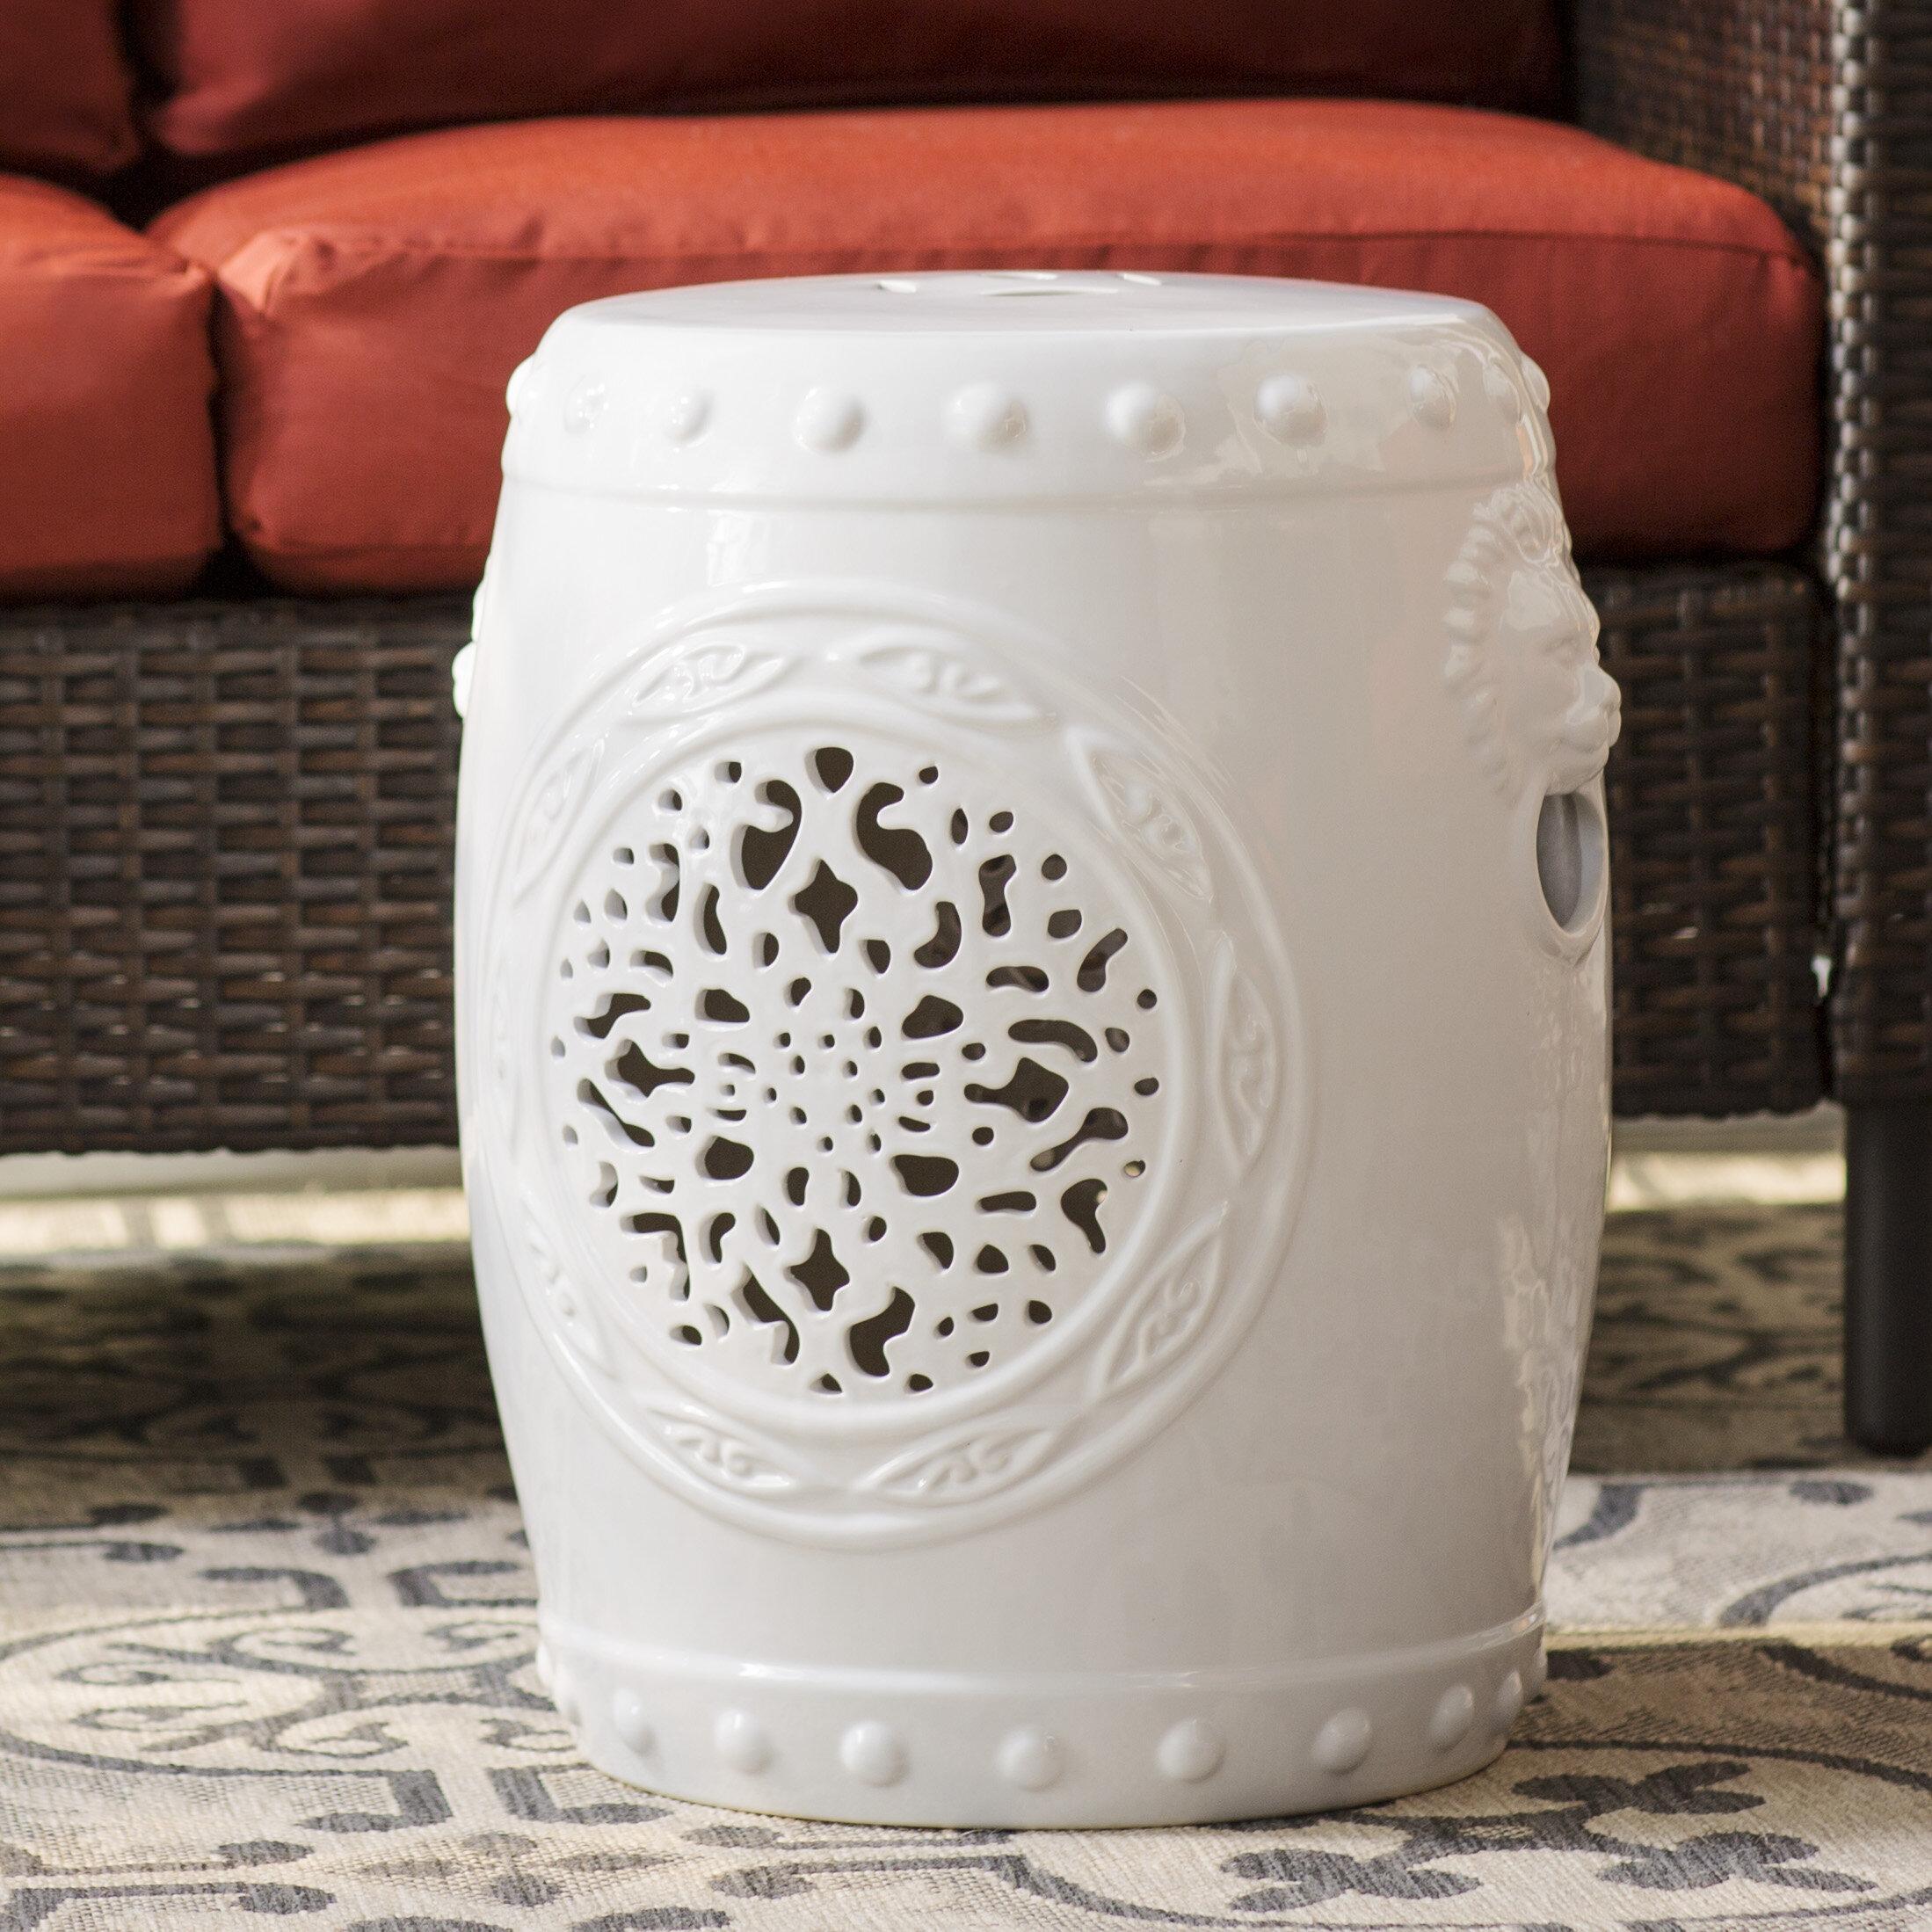 Blue & White Garden Stools You'Ll Love In 2020 | Wayfair Inside Middlet Owl Ceramic Garden Stools (View 8 of 25)